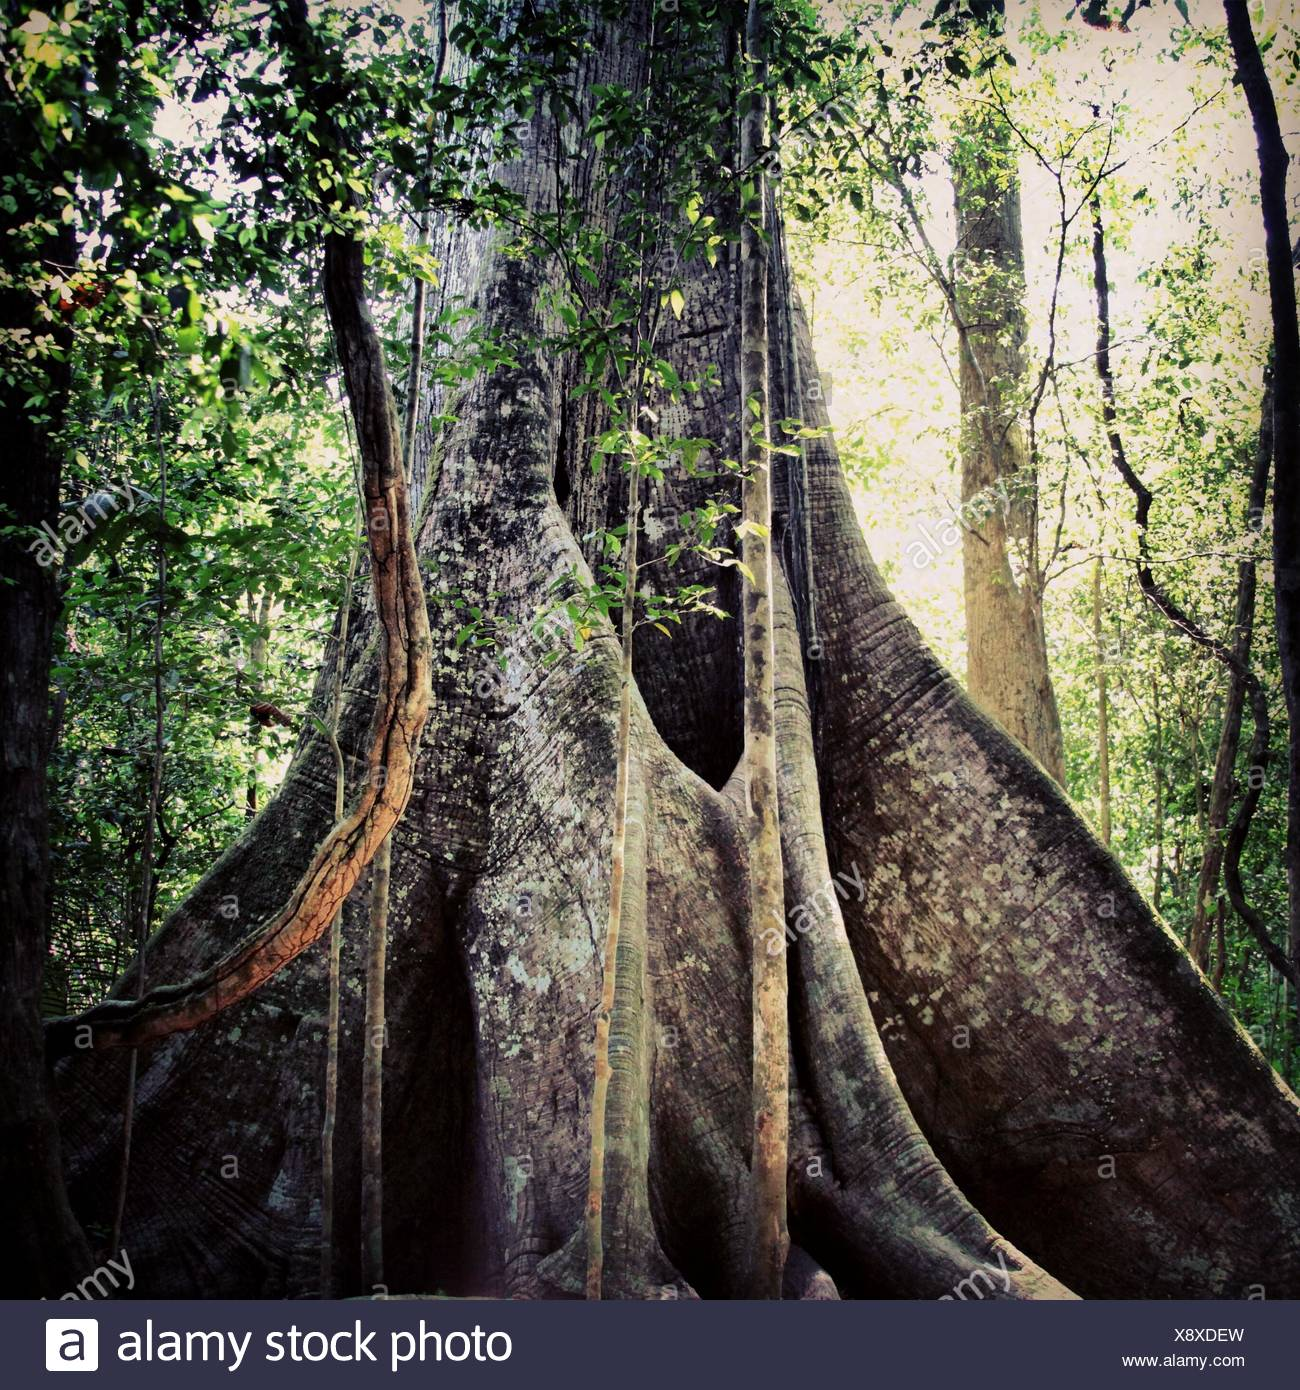 Brazil, Amazon region, Biggest tree of Amazon - Stock Image